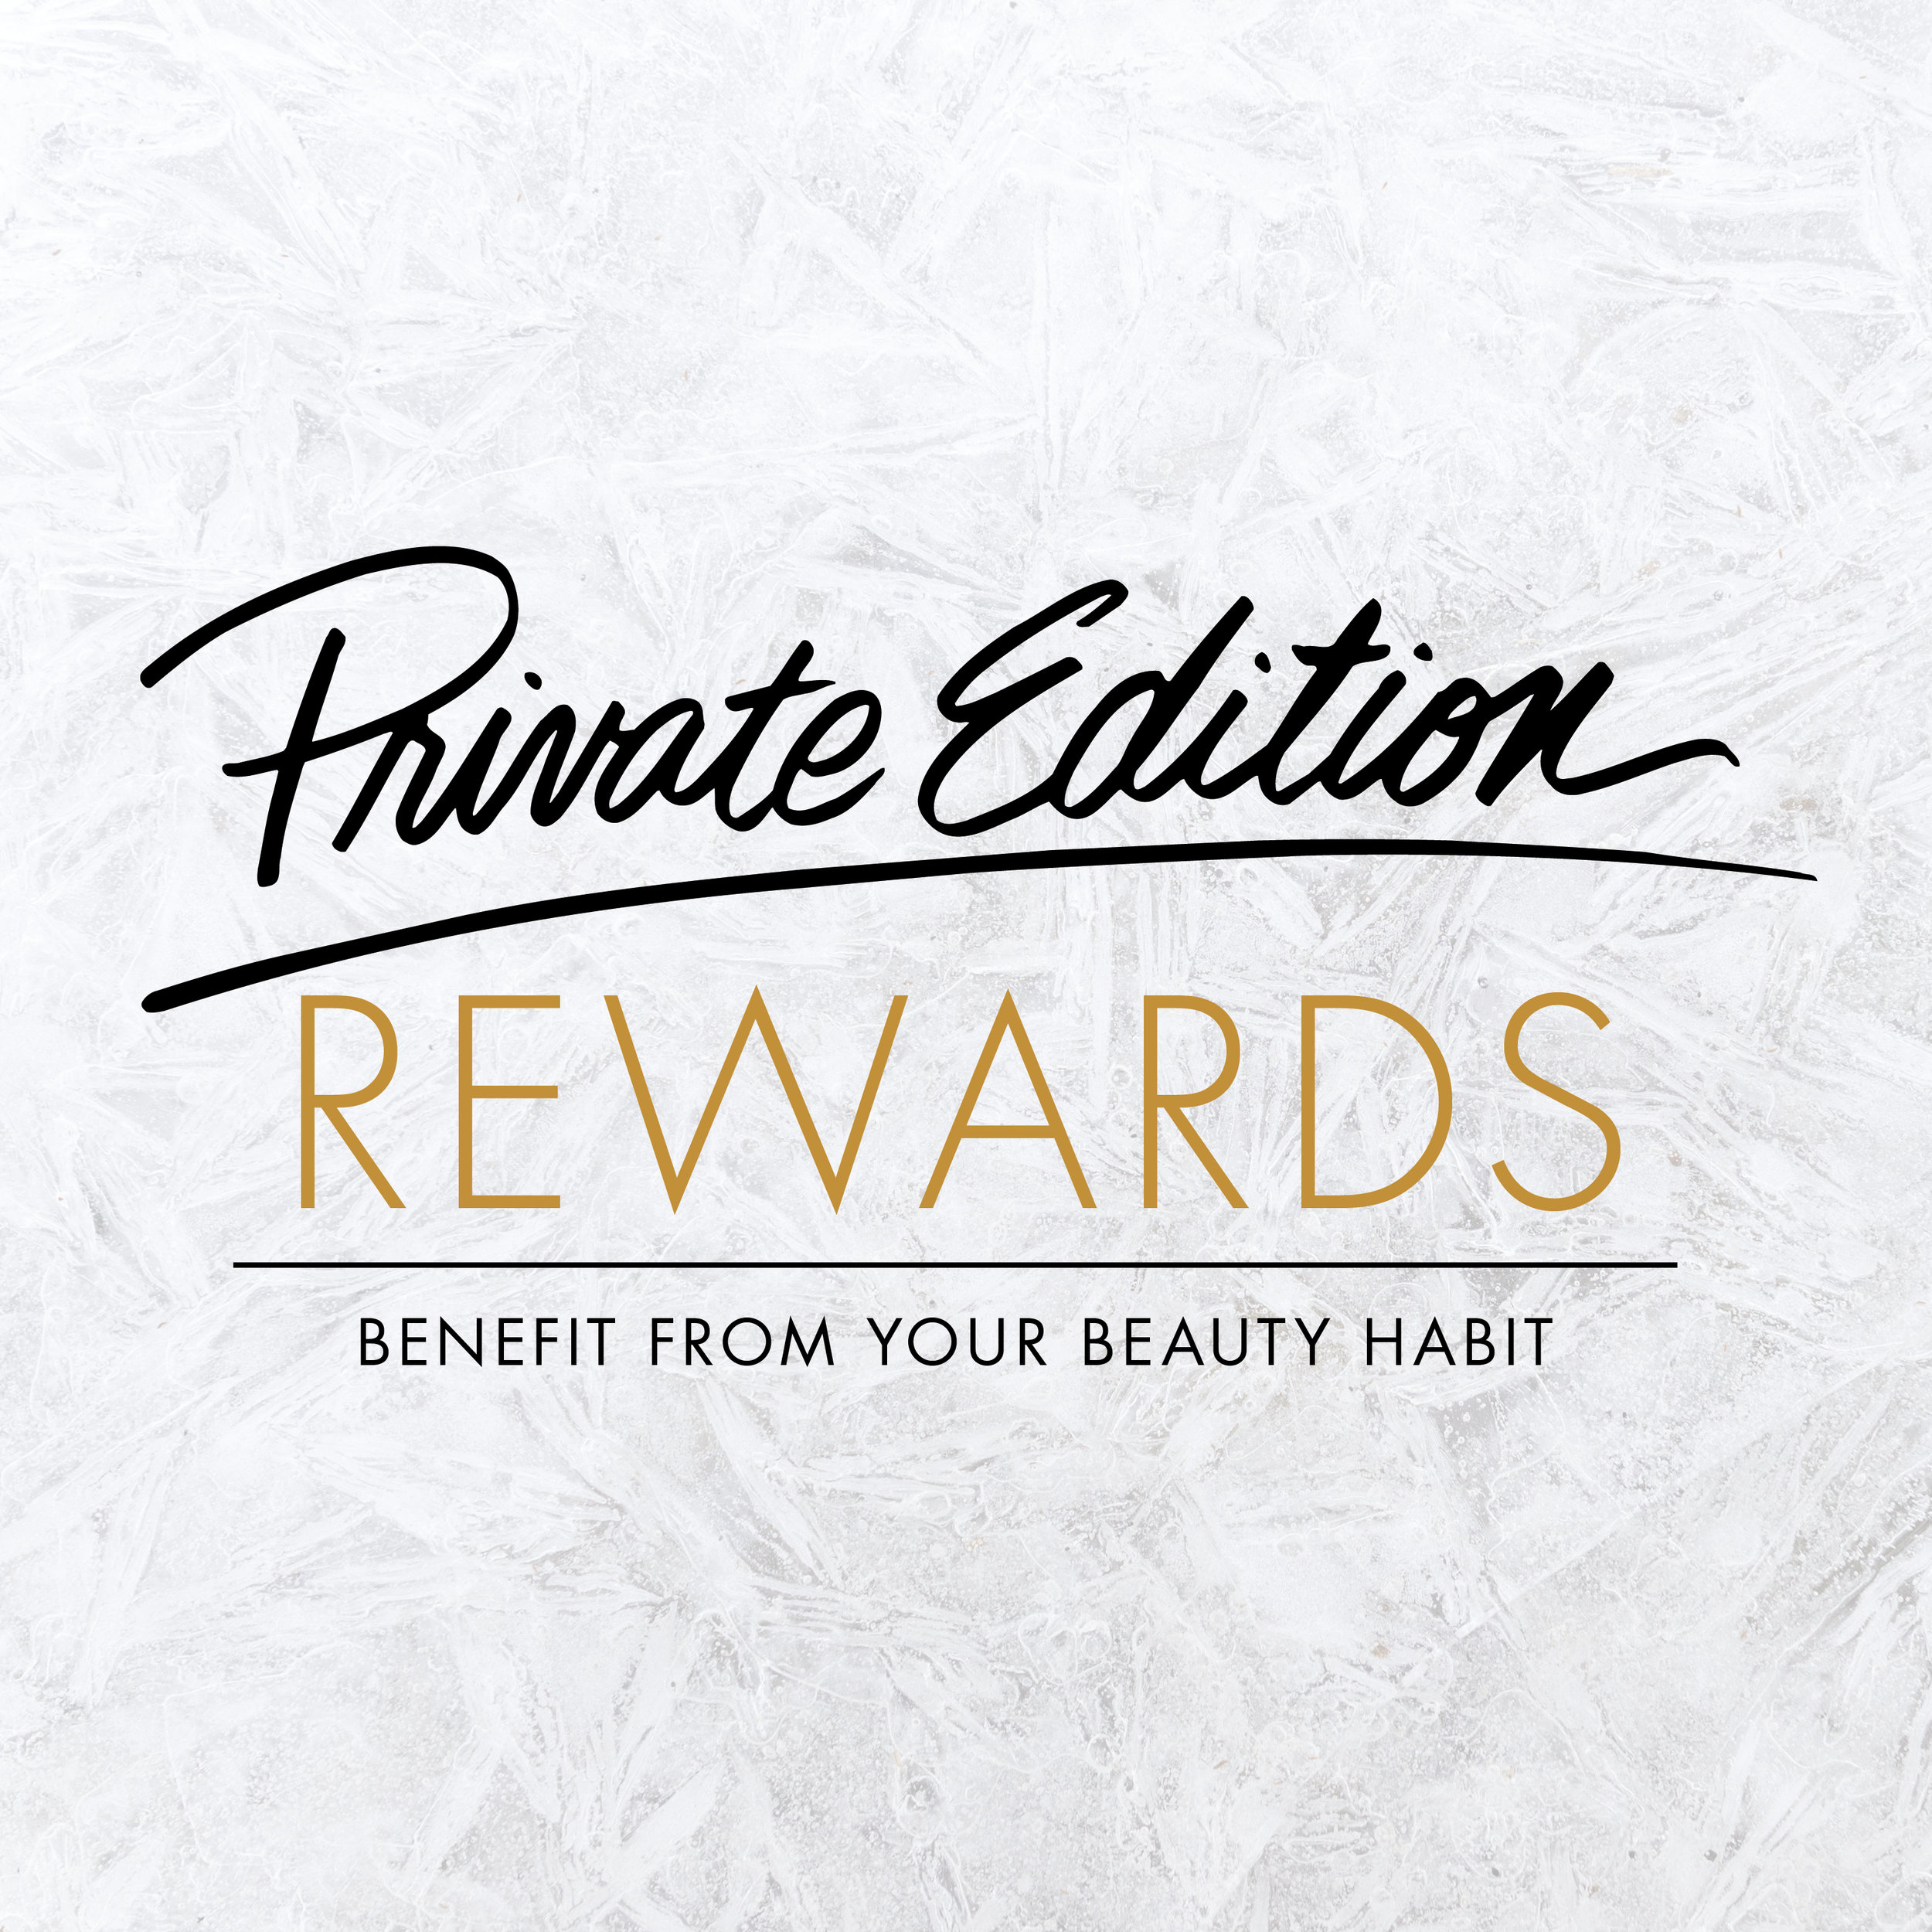 pe_rewards_image_block.jpg